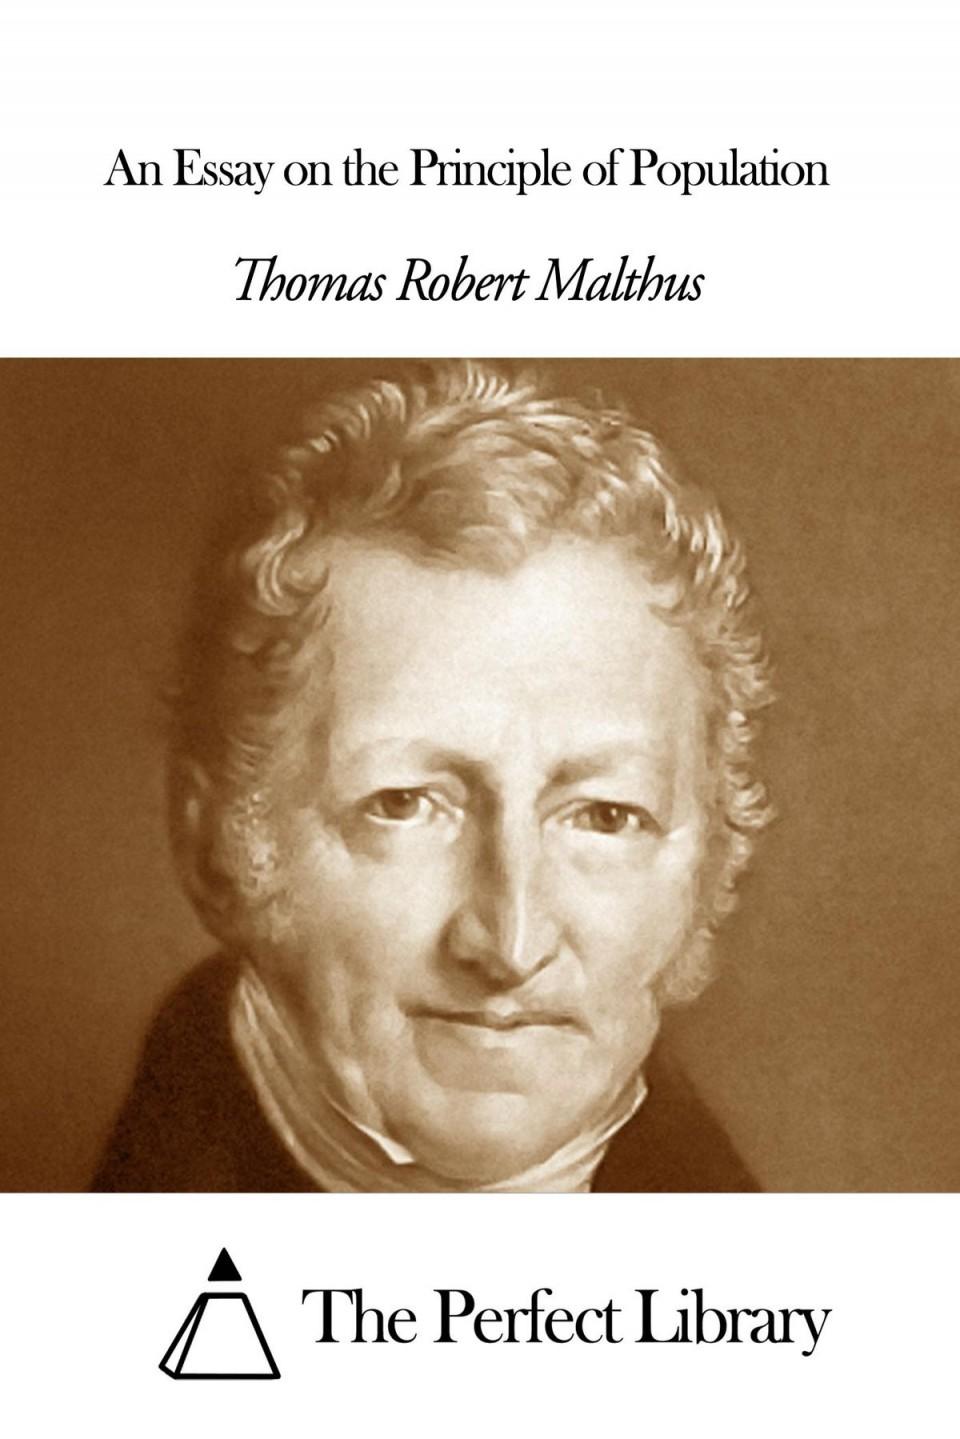 016 Essay Example On The Principle Of Population An Singular Malthus Sparknotes Thomas Main Idea 960